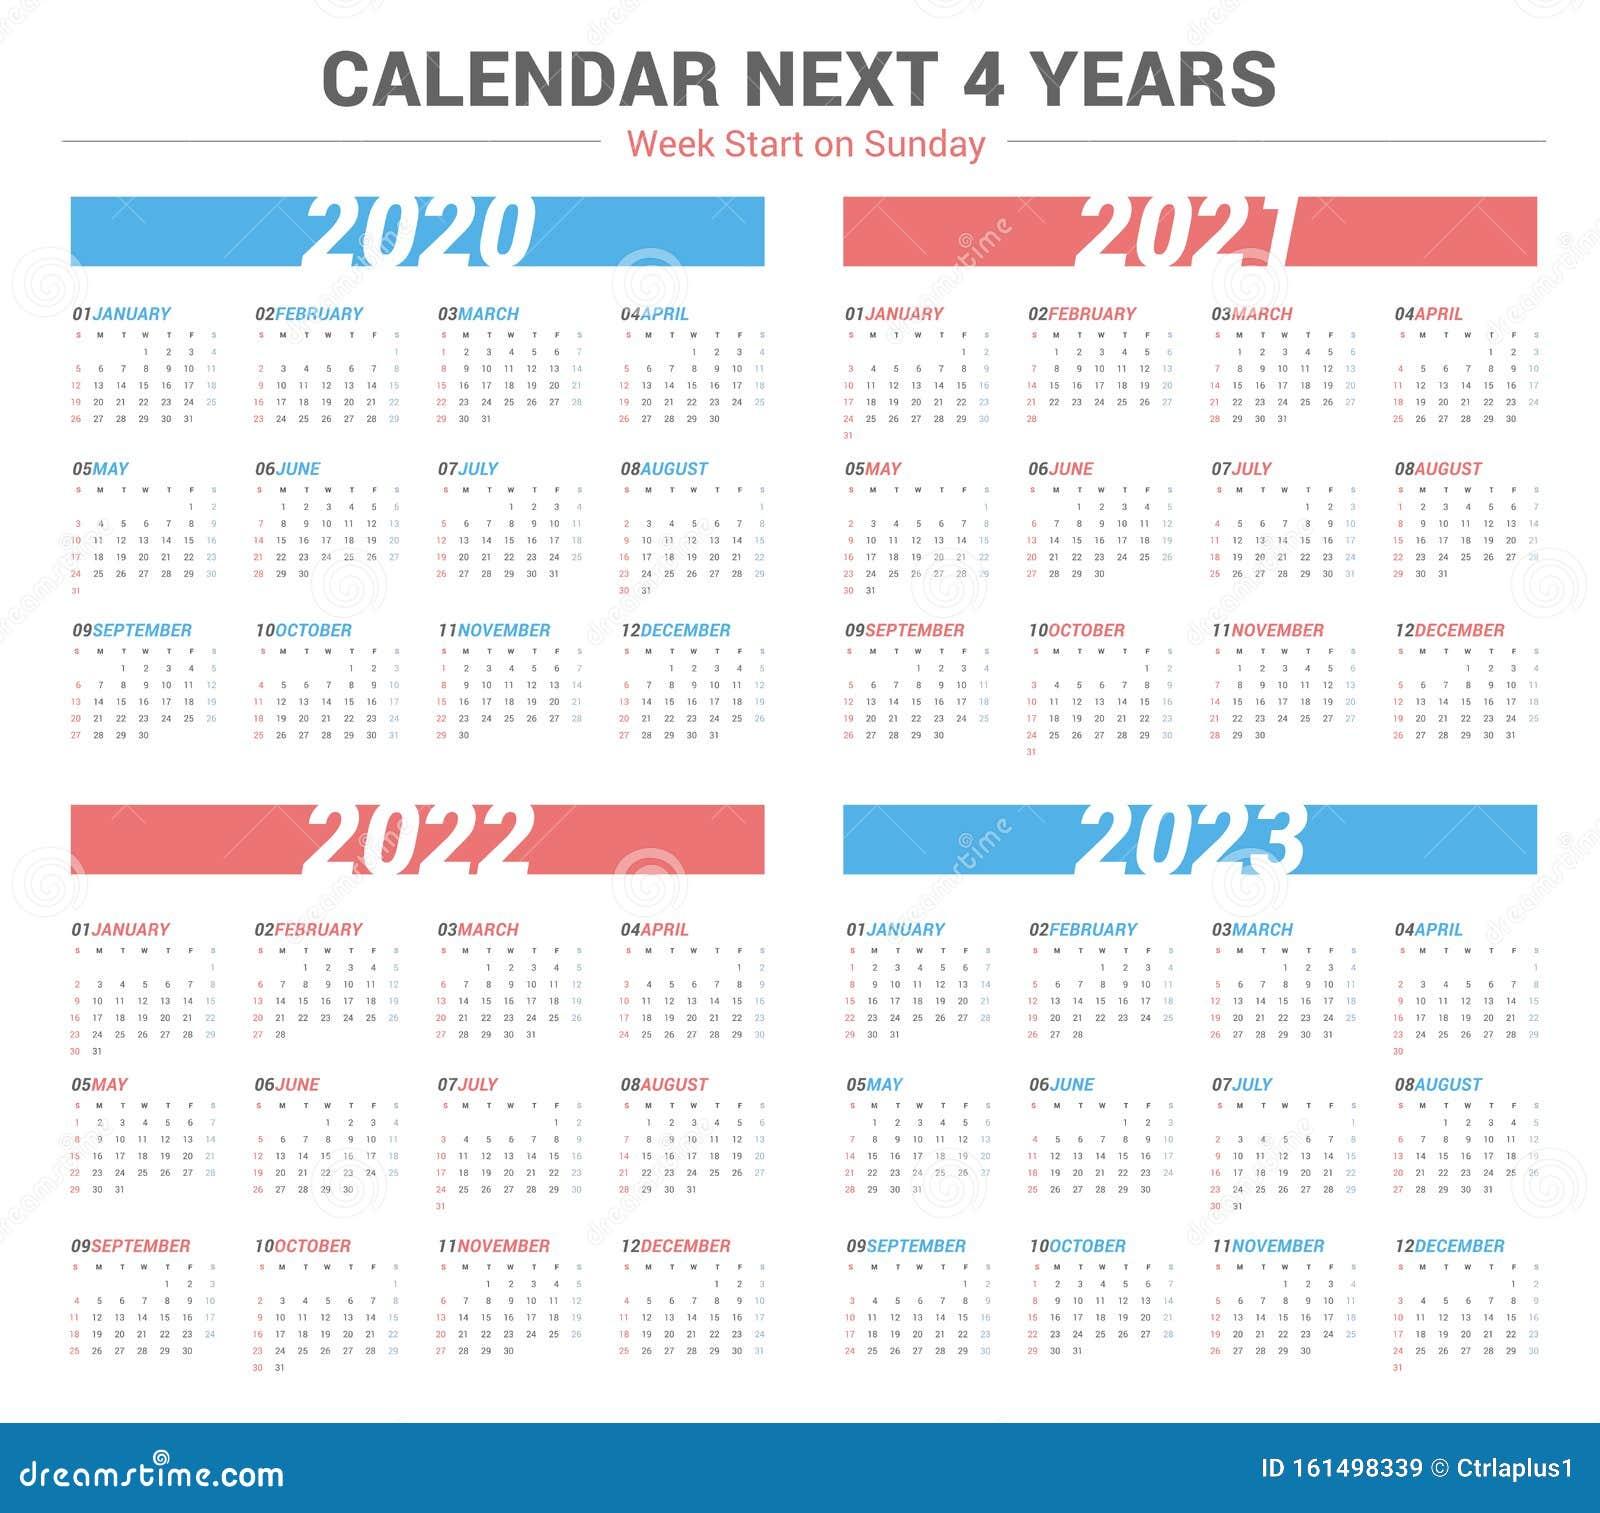 Calendrier Trial 4×4 2022 Simple Calendar For 4 Years 2020 2021 2022 2023. Week Start On